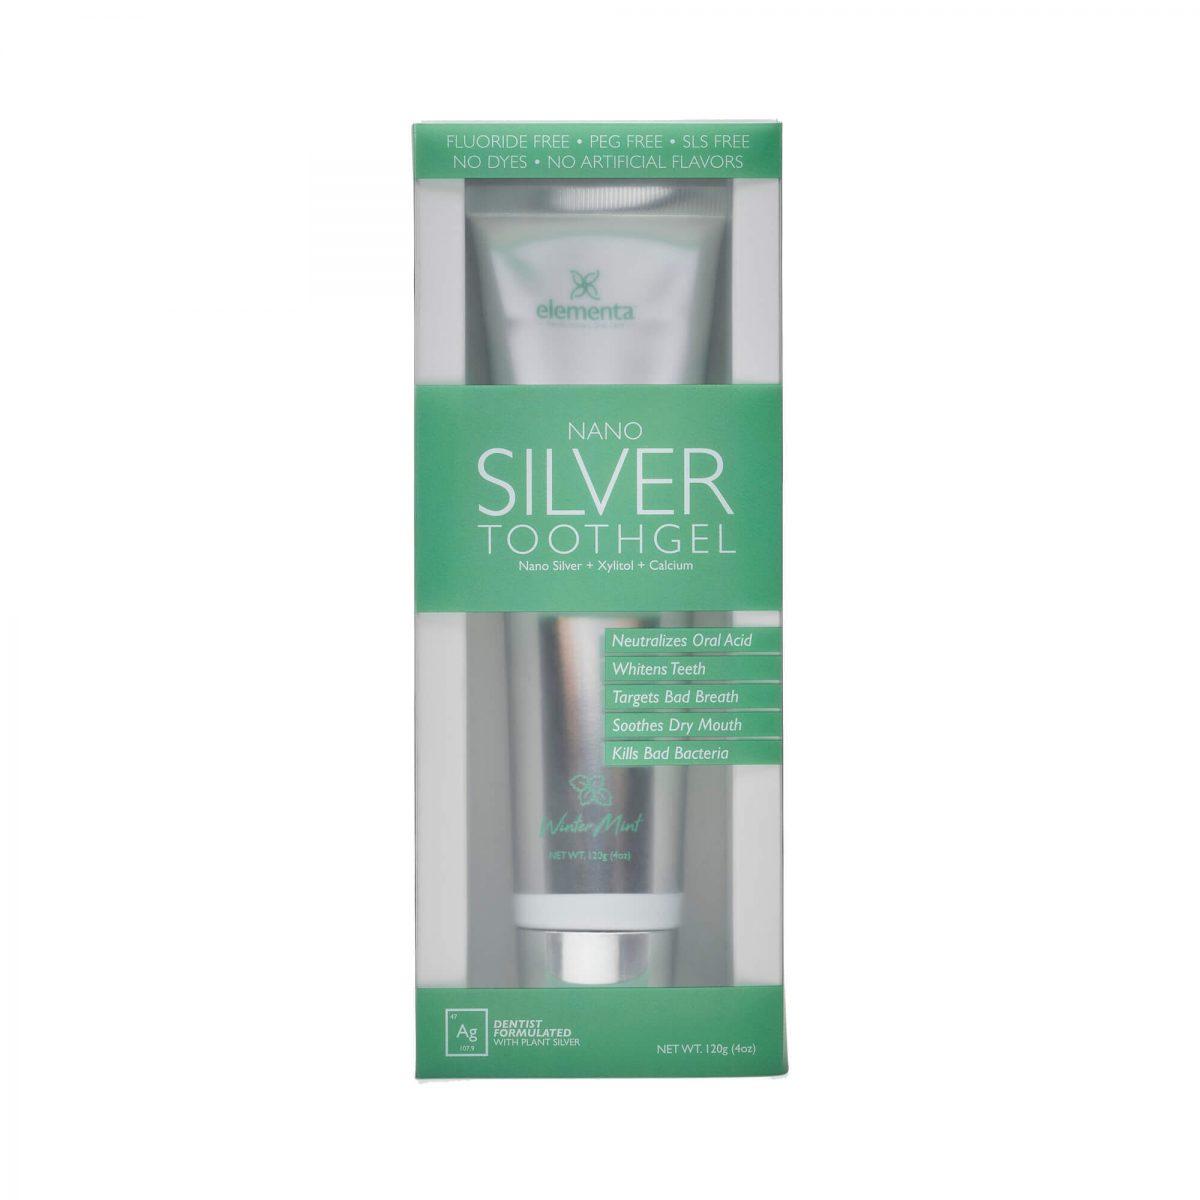 nano silver tooth gel winter mint 40 oz